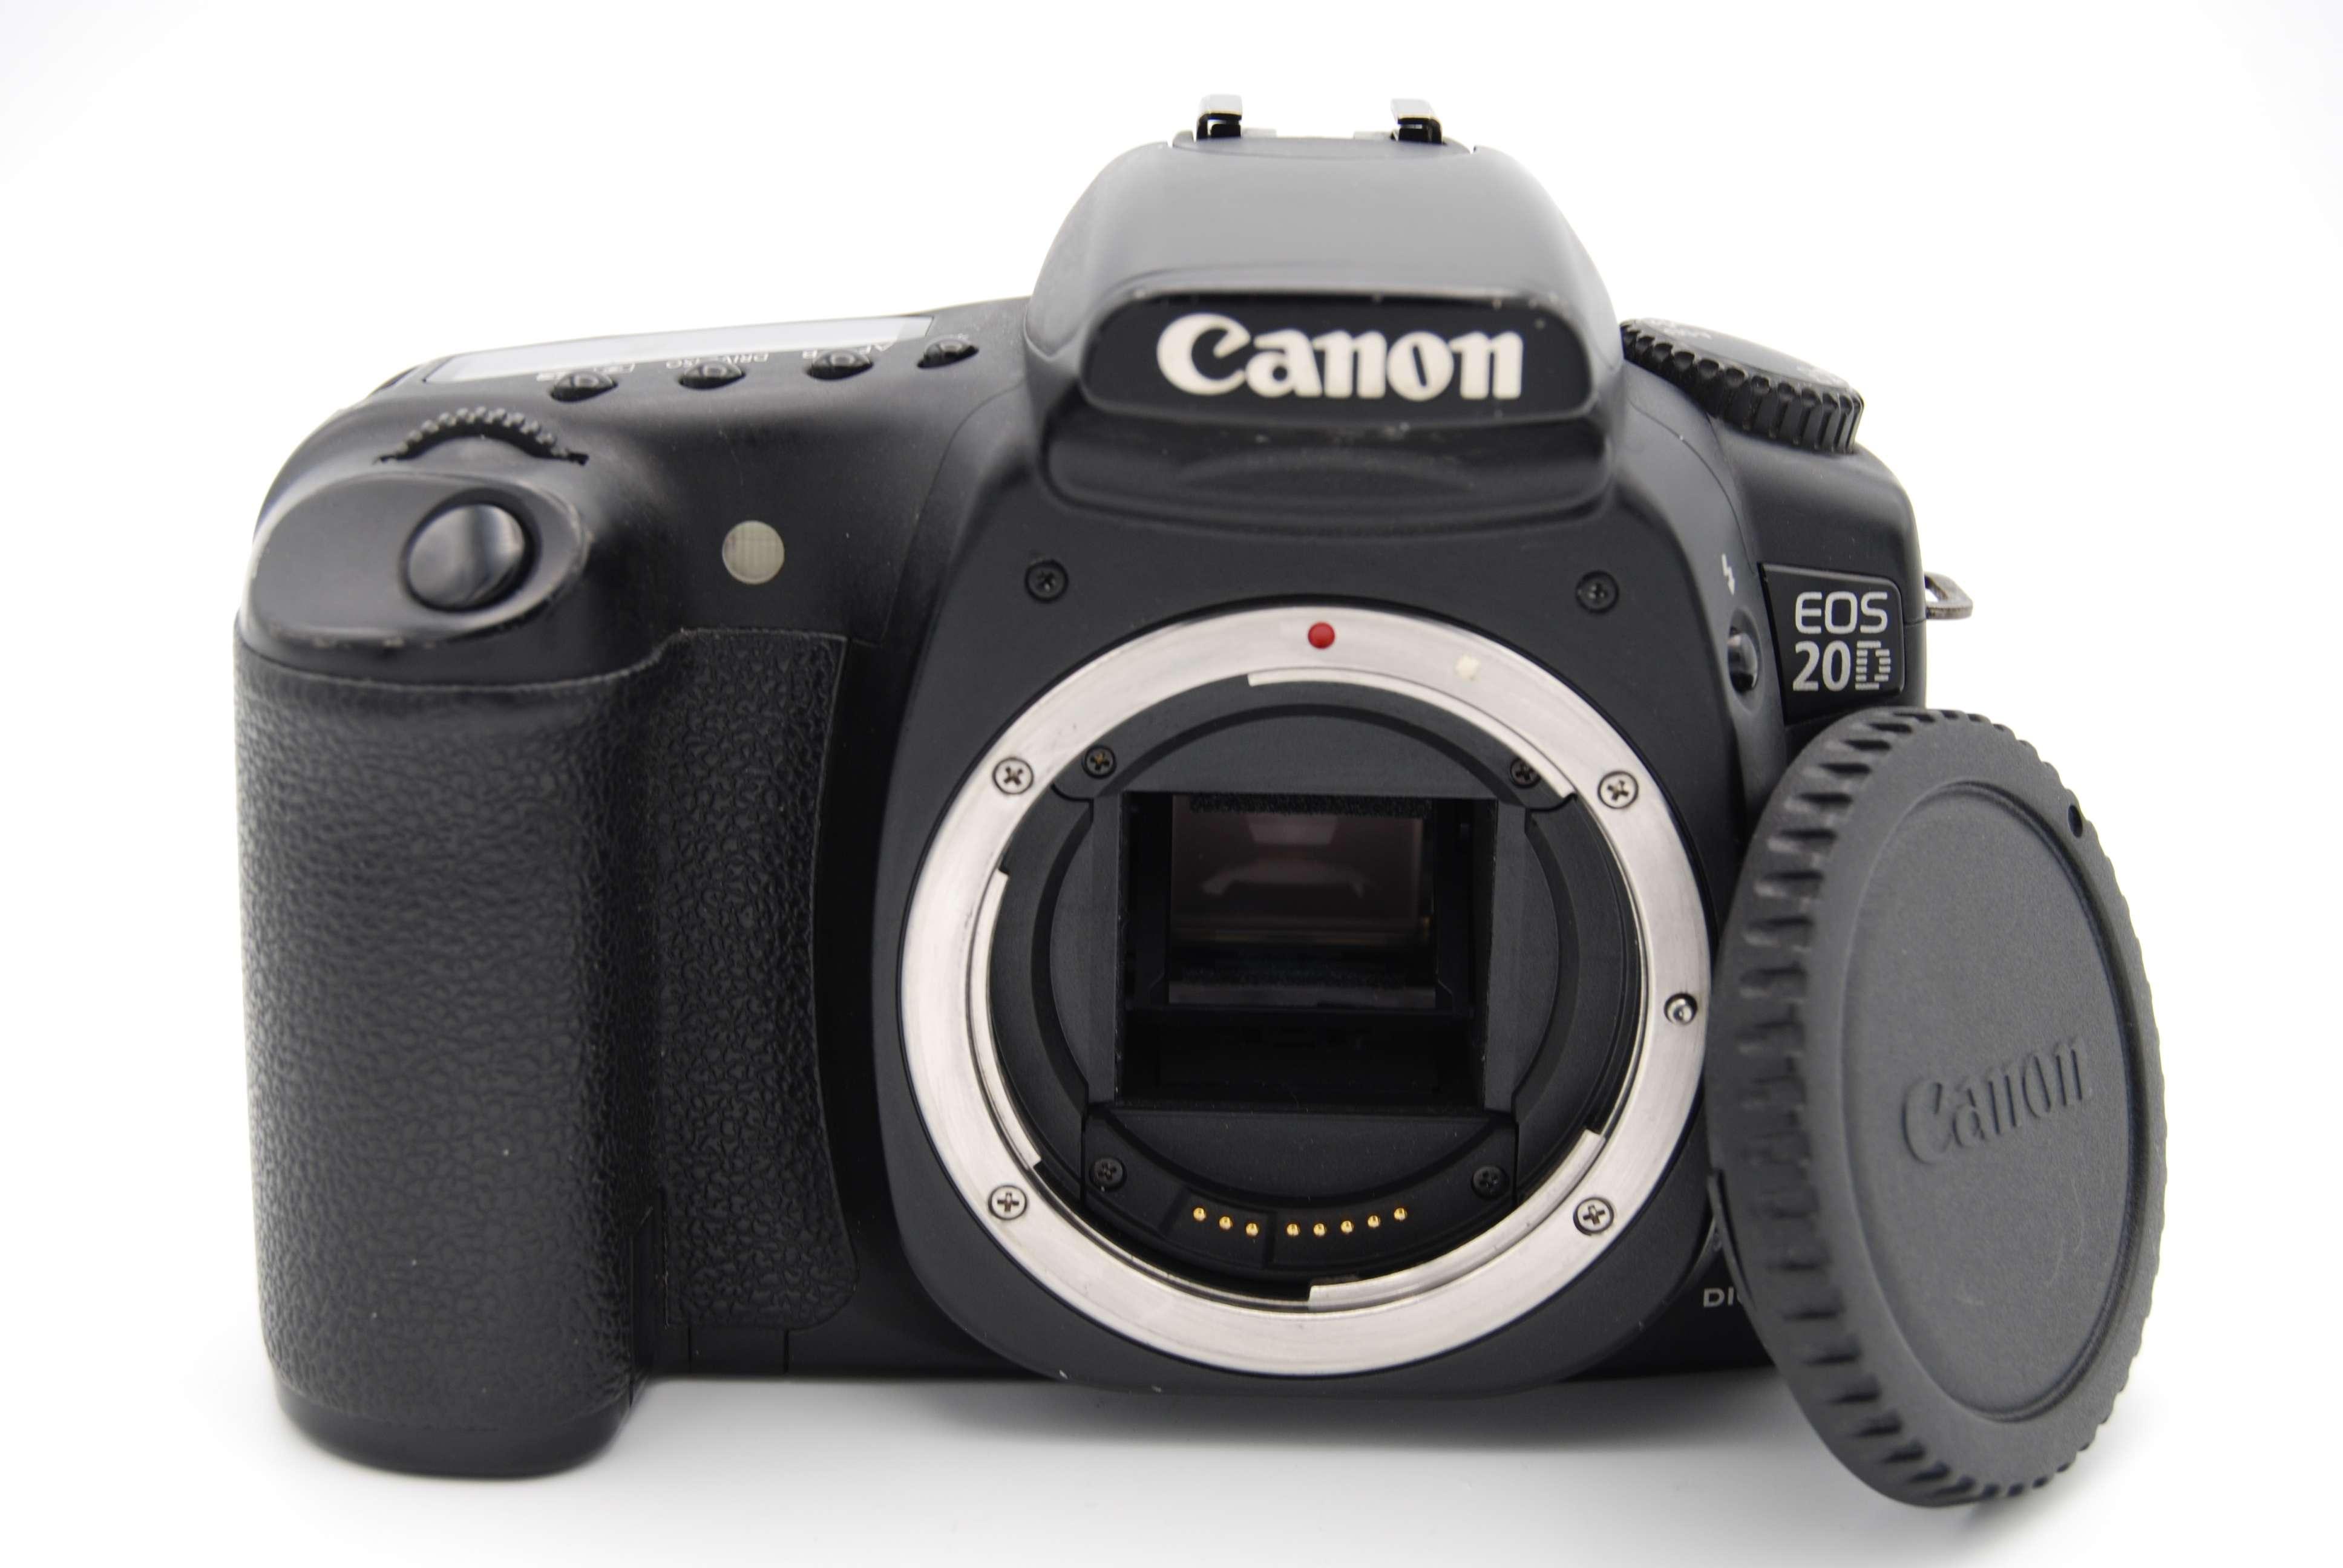 CANON 20D 8.2MP 1.8''SCREEN DIGITAL SLR CAMERA - BODY ONLY